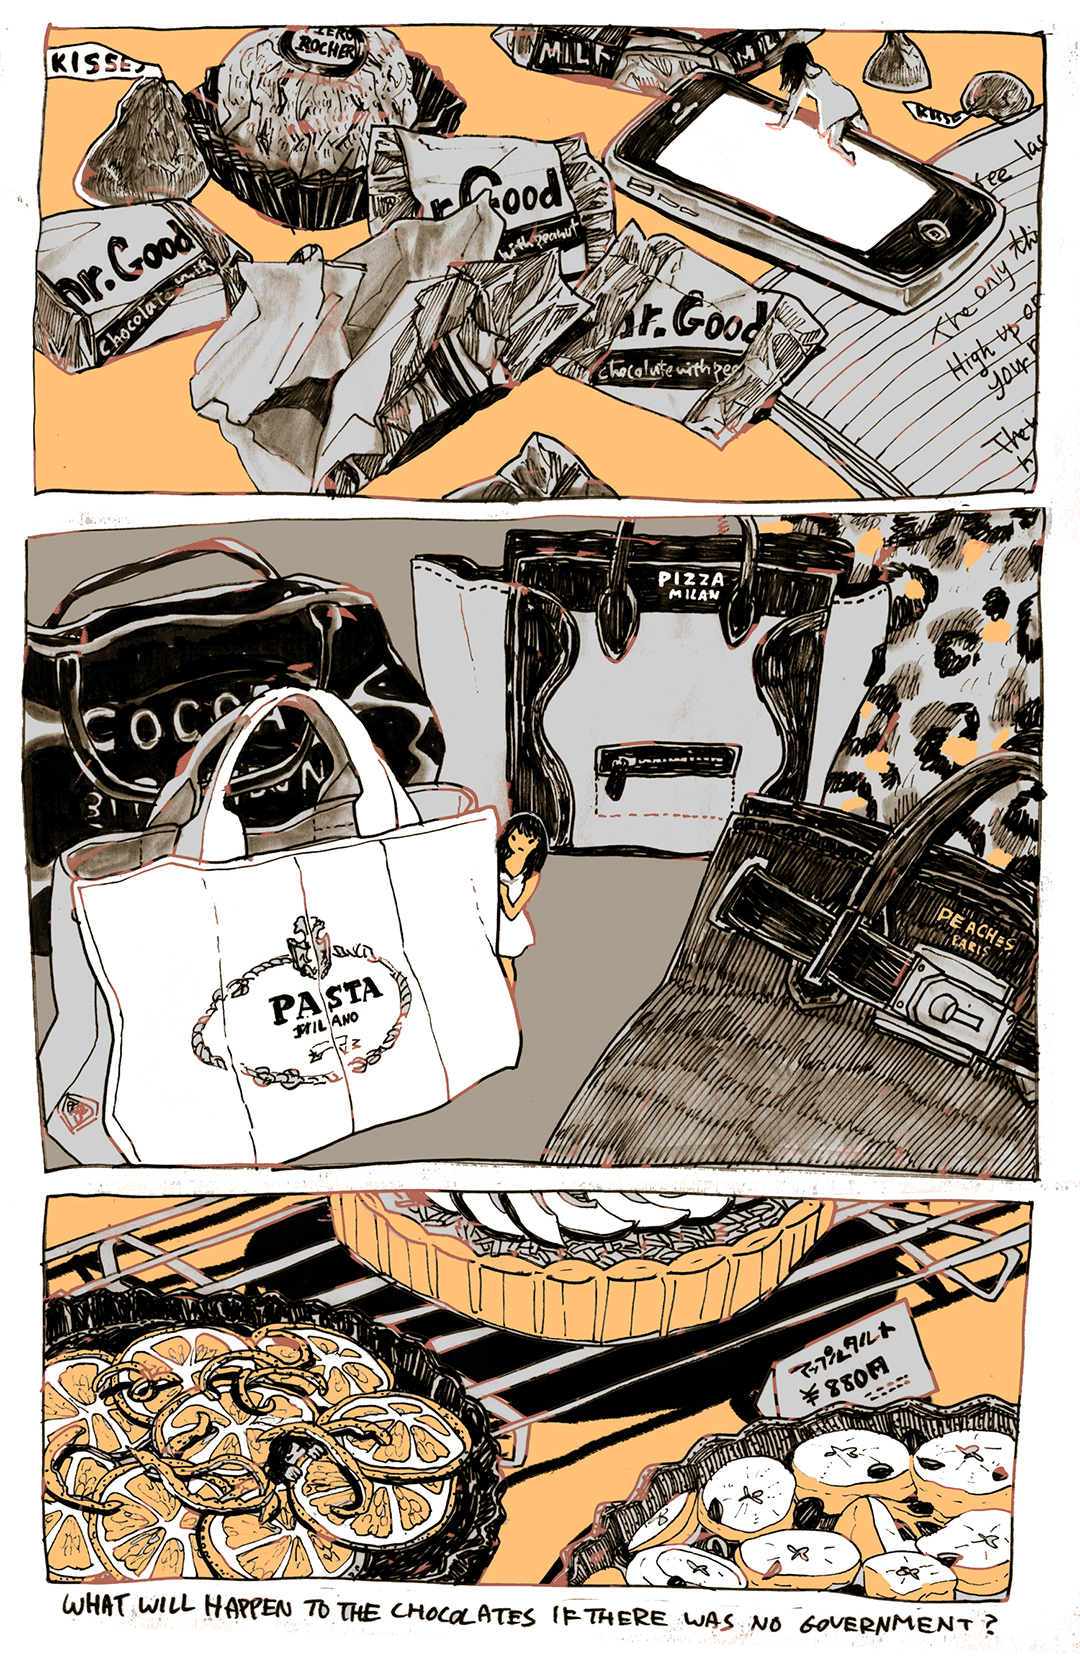 GirlsclubAsia-Illustrator-COHOCLATE GOV_Lisa Kogawa